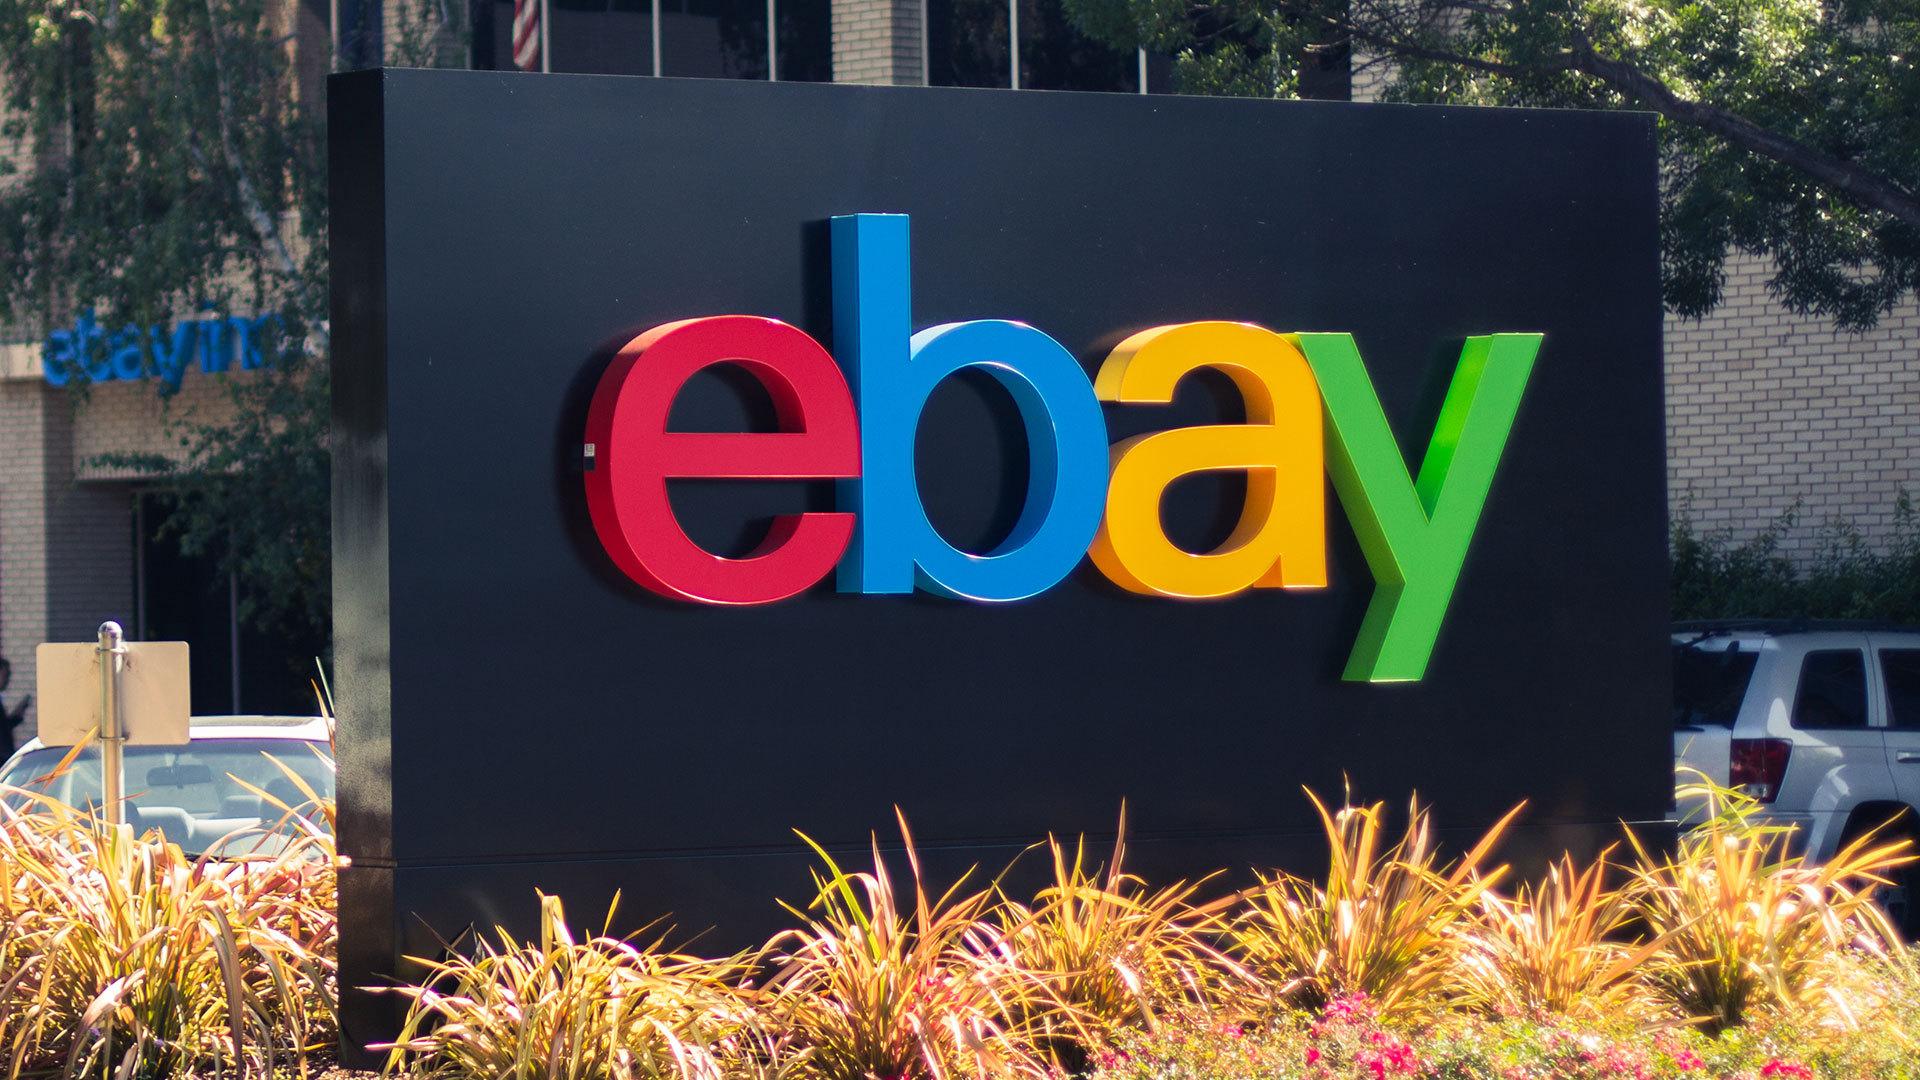 Ebay Wallpaper Ebay Logo Black Background 1920x1080 Wallpaper Teahub Io